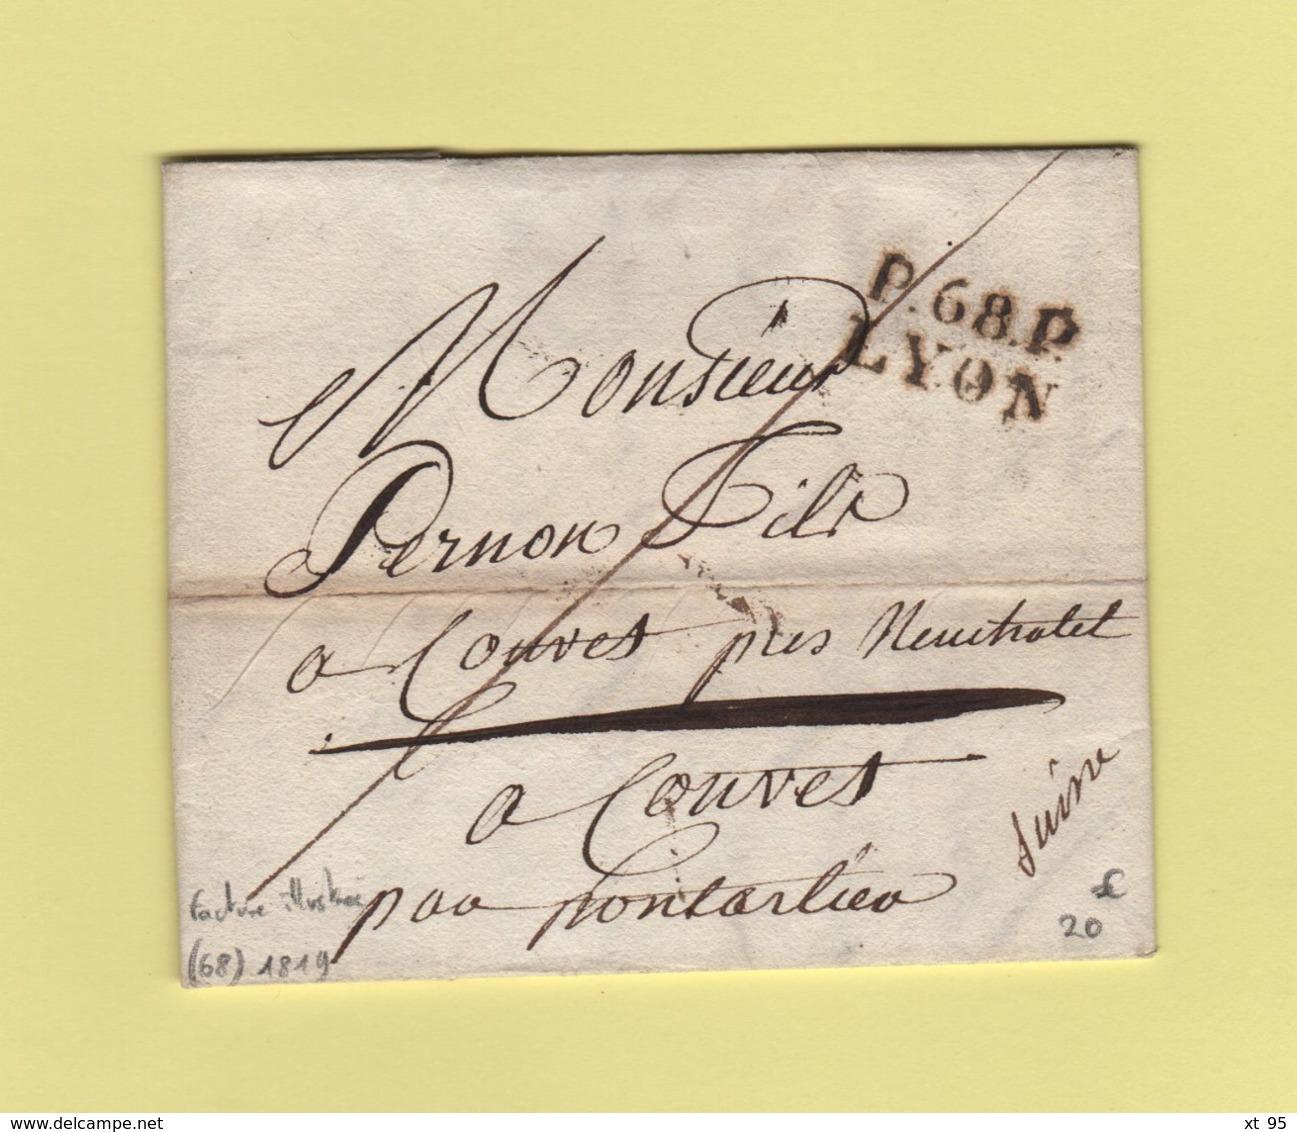 Lyon - 68 - Rhone - Port Paye - 1819 - Facture Illustree - Marcophilie (Lettres)